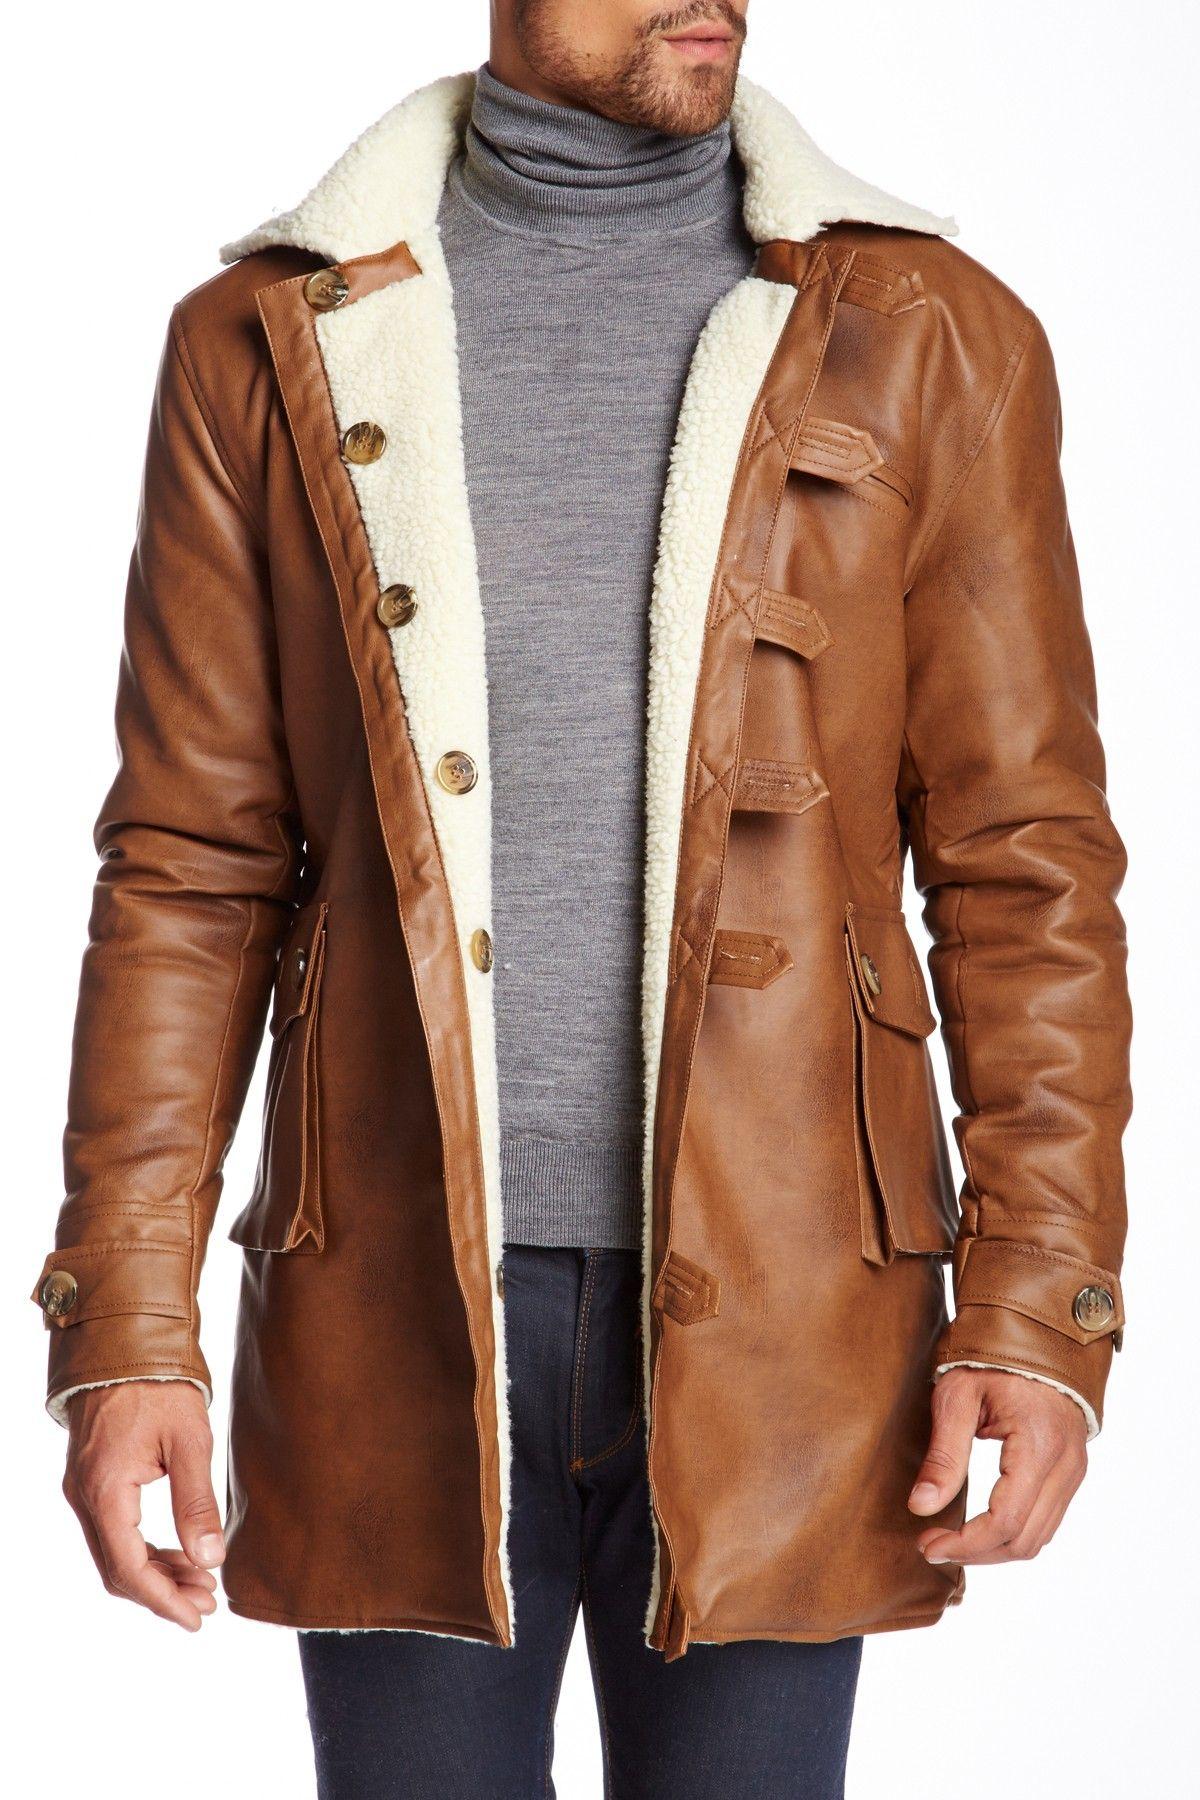 Seduka Faux Fur Lined Faux Leather Coat Faux leather